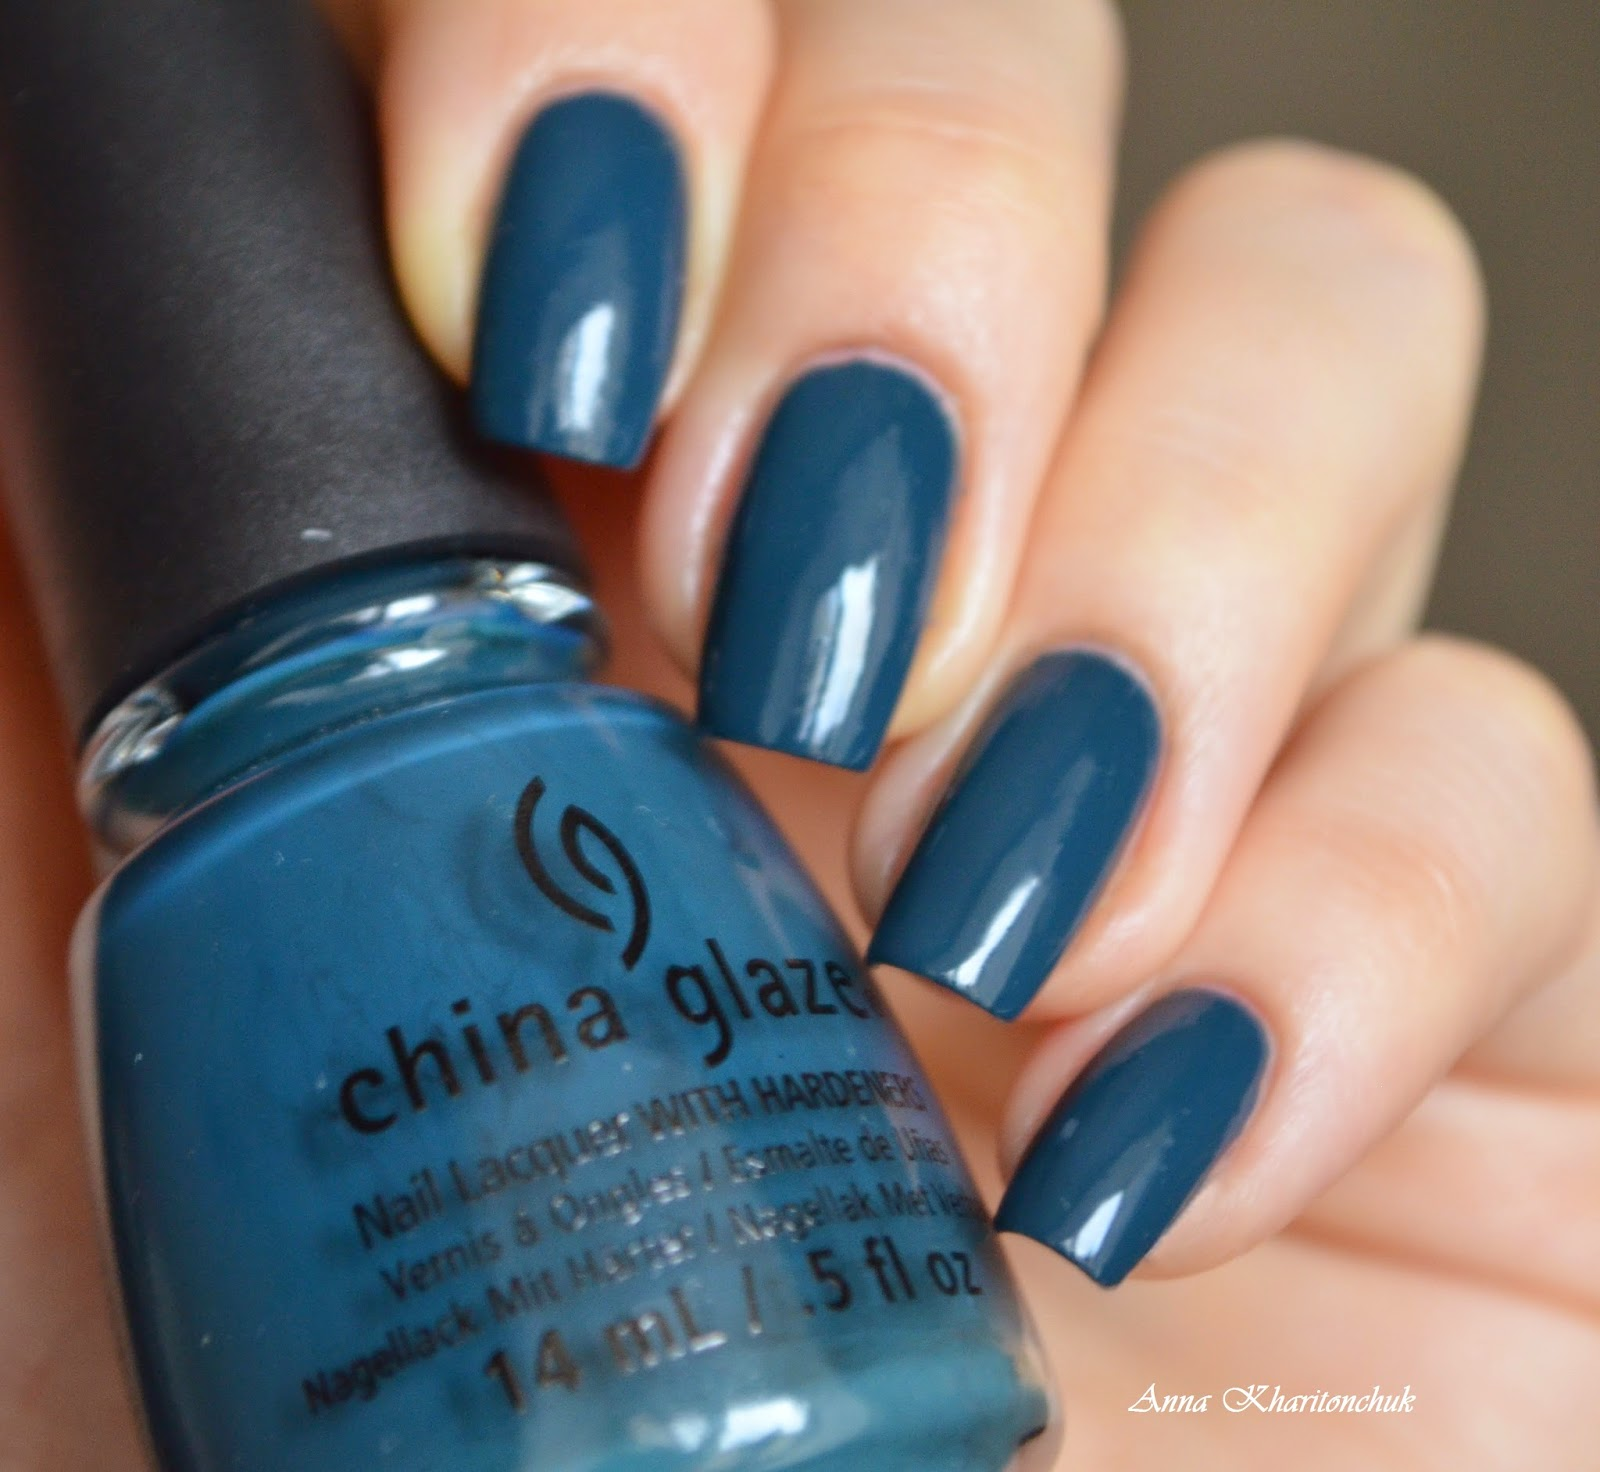 China Glaze Well Trained, Sally Hansen Hard as Nails Xtreme Wear Glitter Effect # 970 Family Jewels стемпинг BP-28 и краска для стемпинга Enas